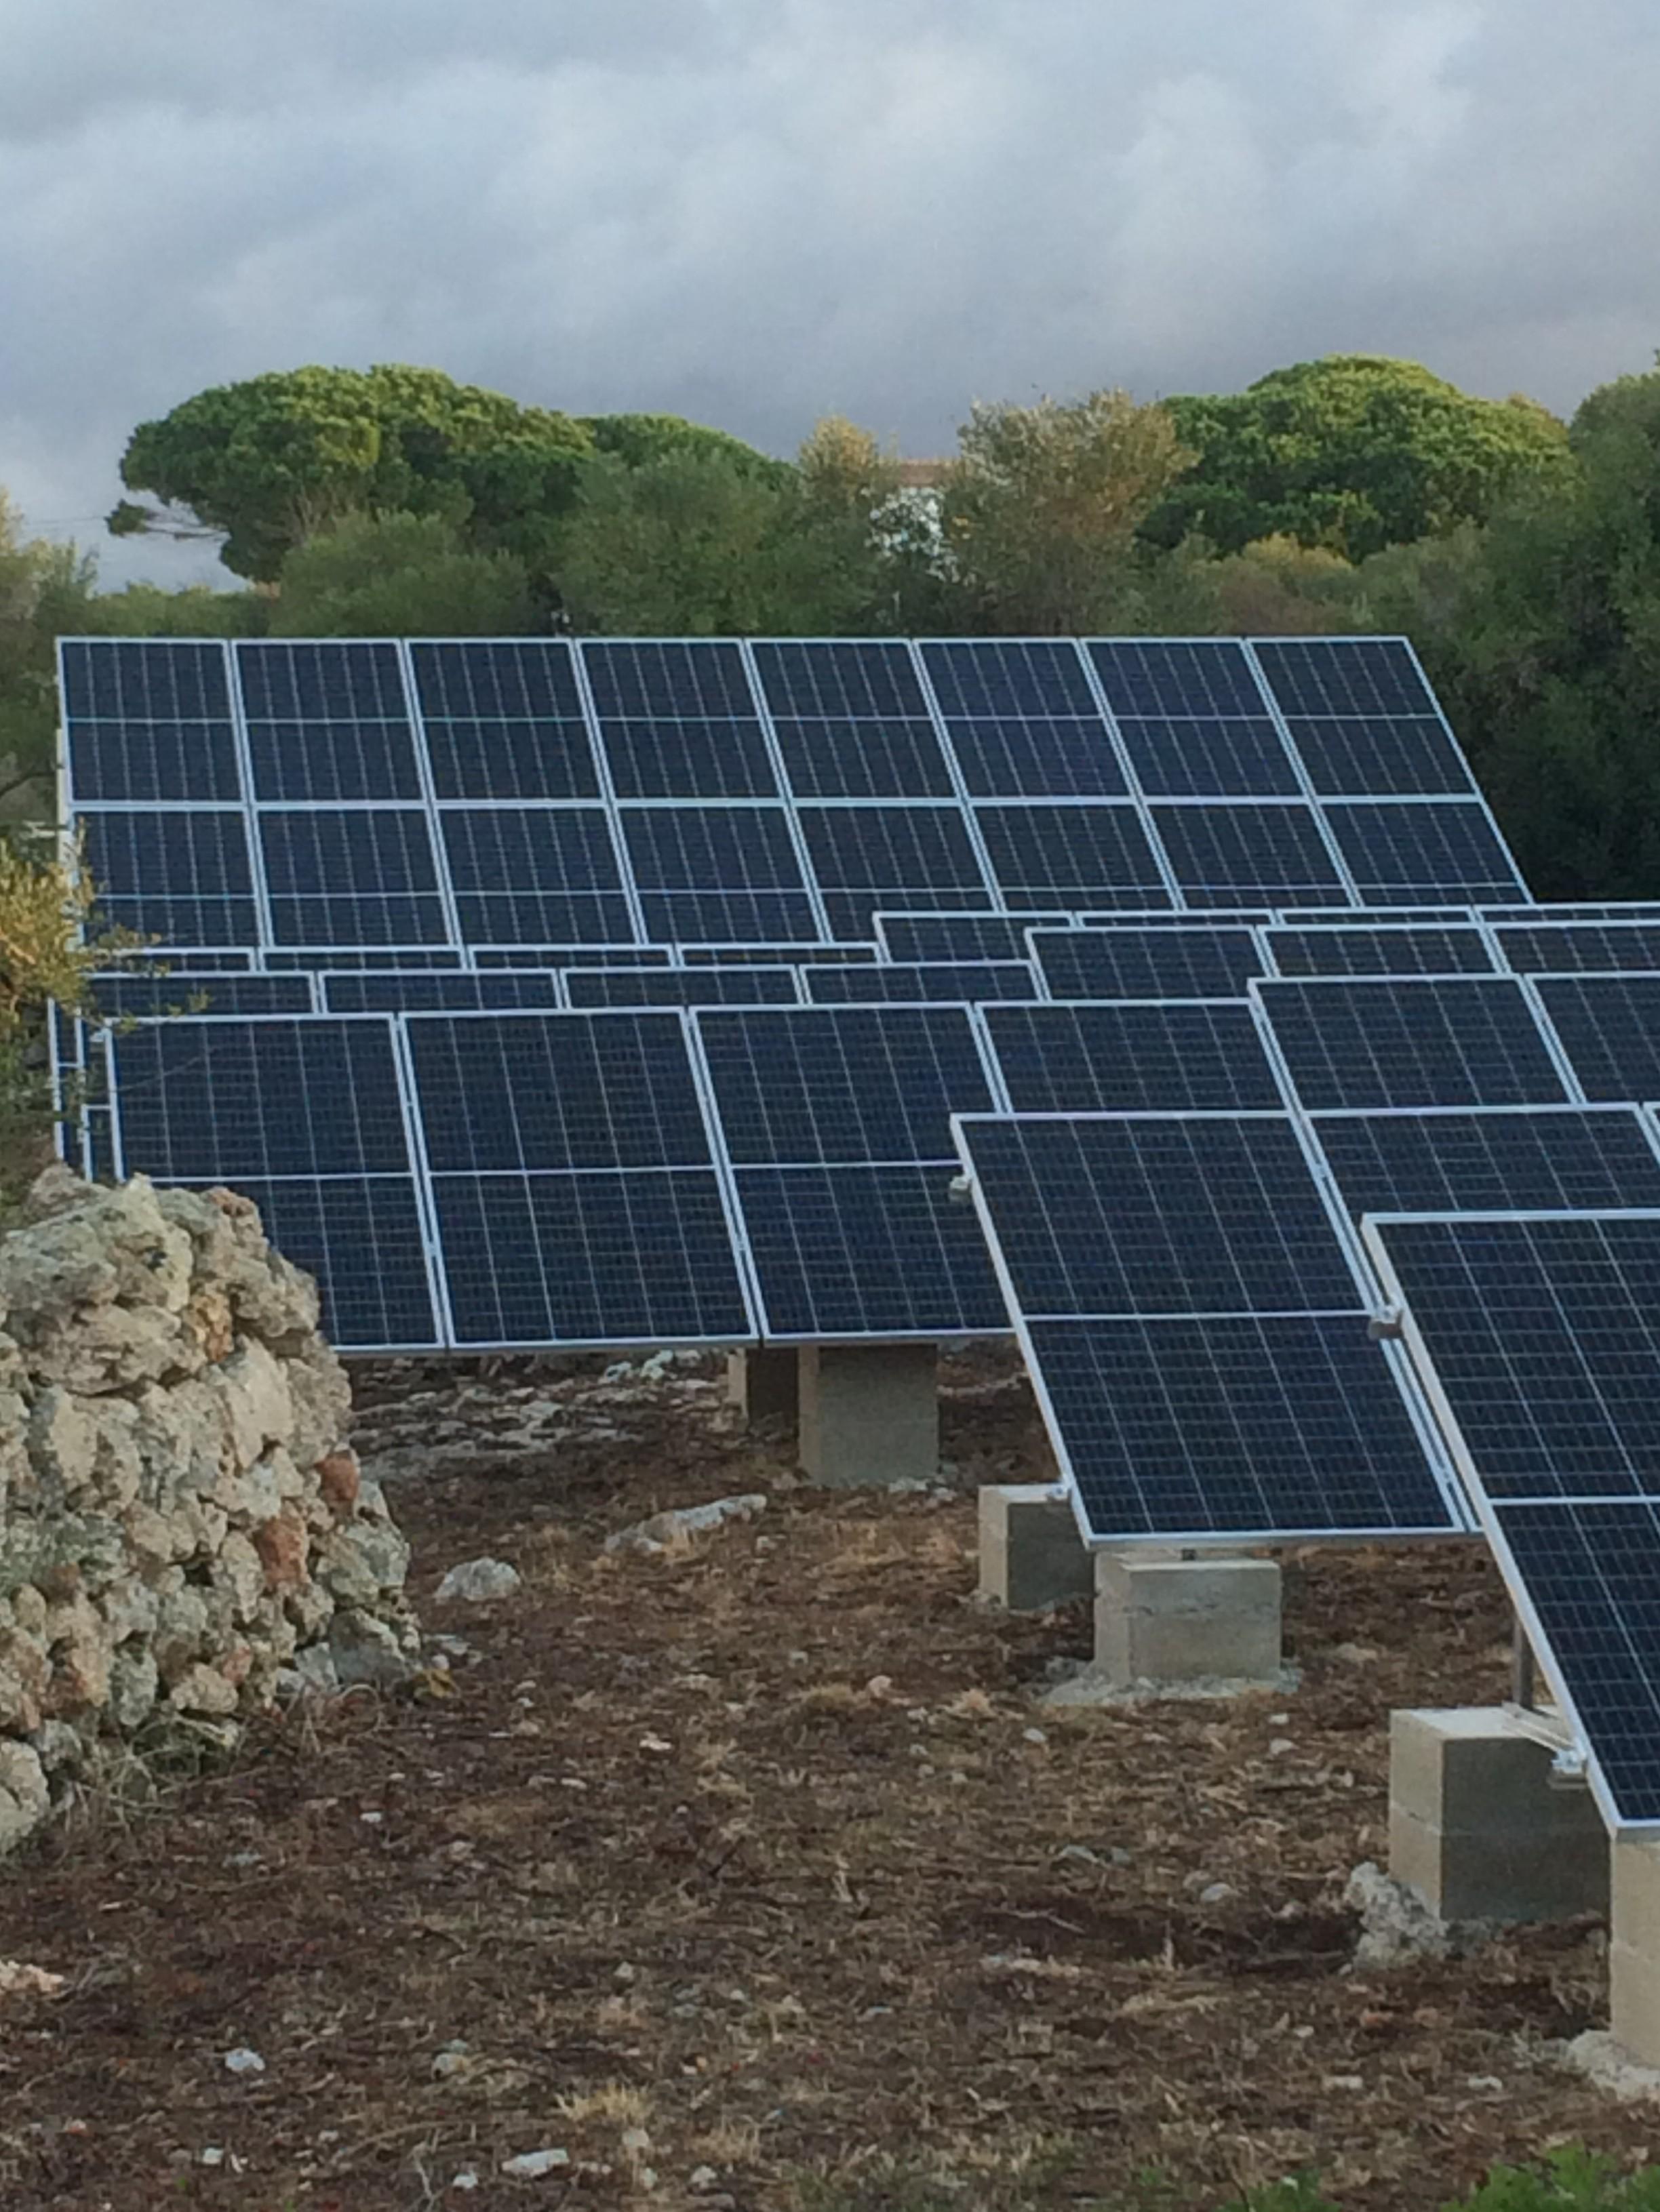 Instalación fotovoltaica aislada en finca rústica.